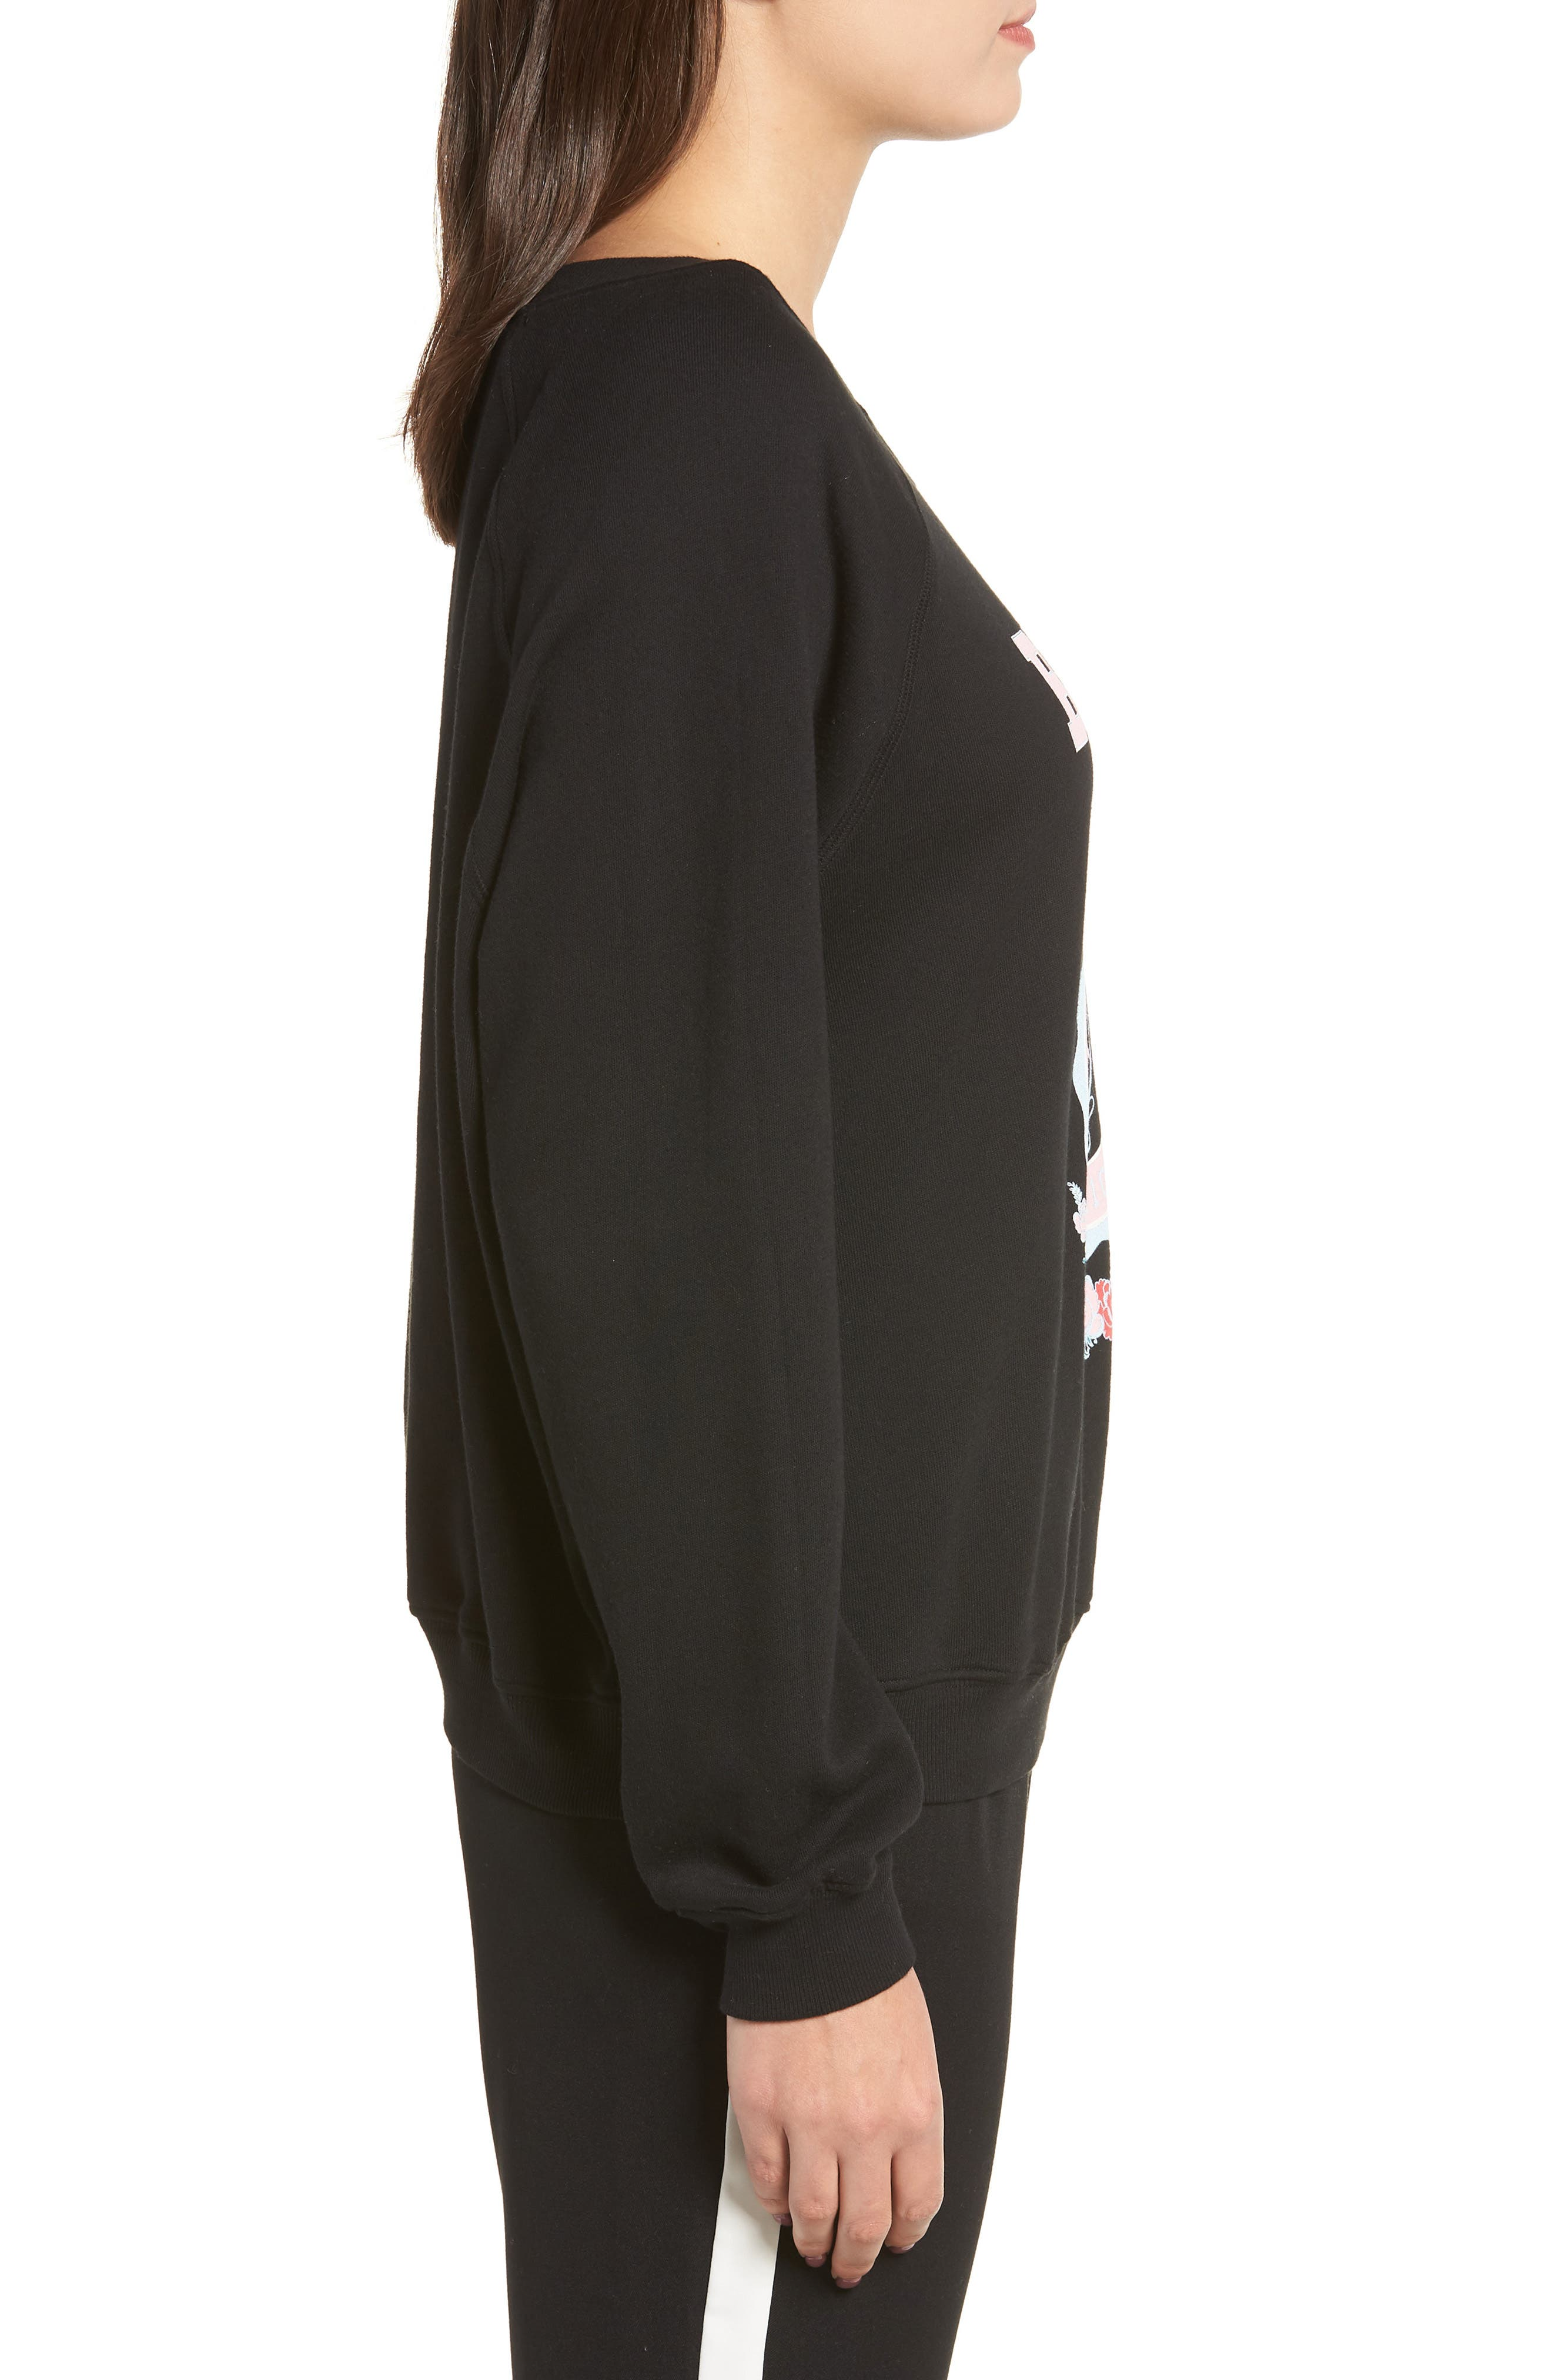 Beverly Hills Crest Sommers Sweatshirt,                             Alternate thumbnail 3, color,                             CLEAN BLACK